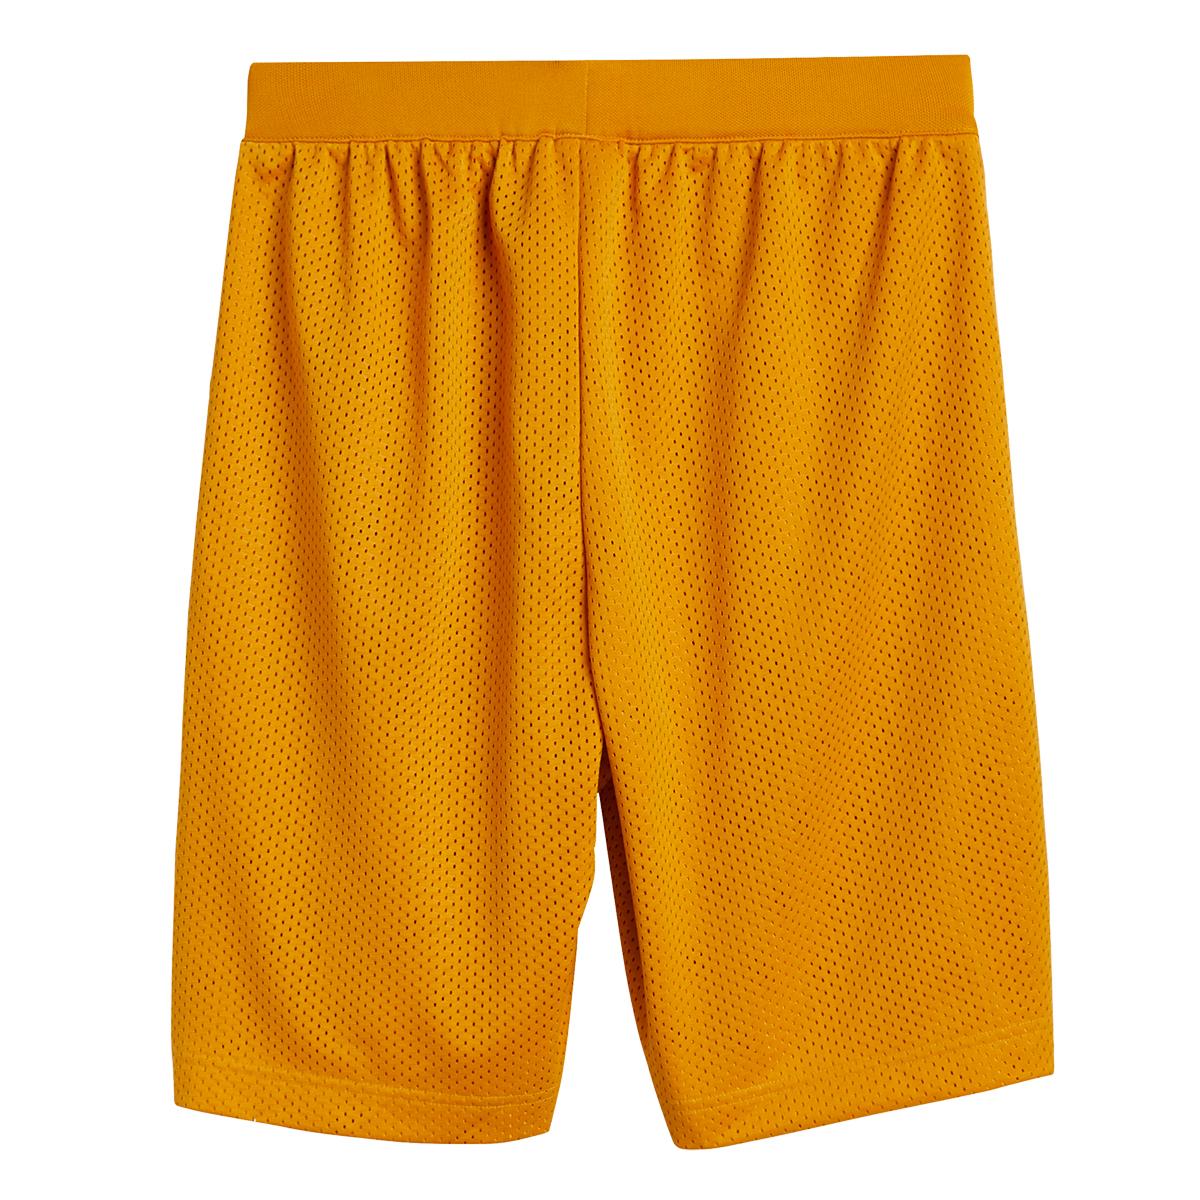 adidas Jonah Hill Classic Shorts